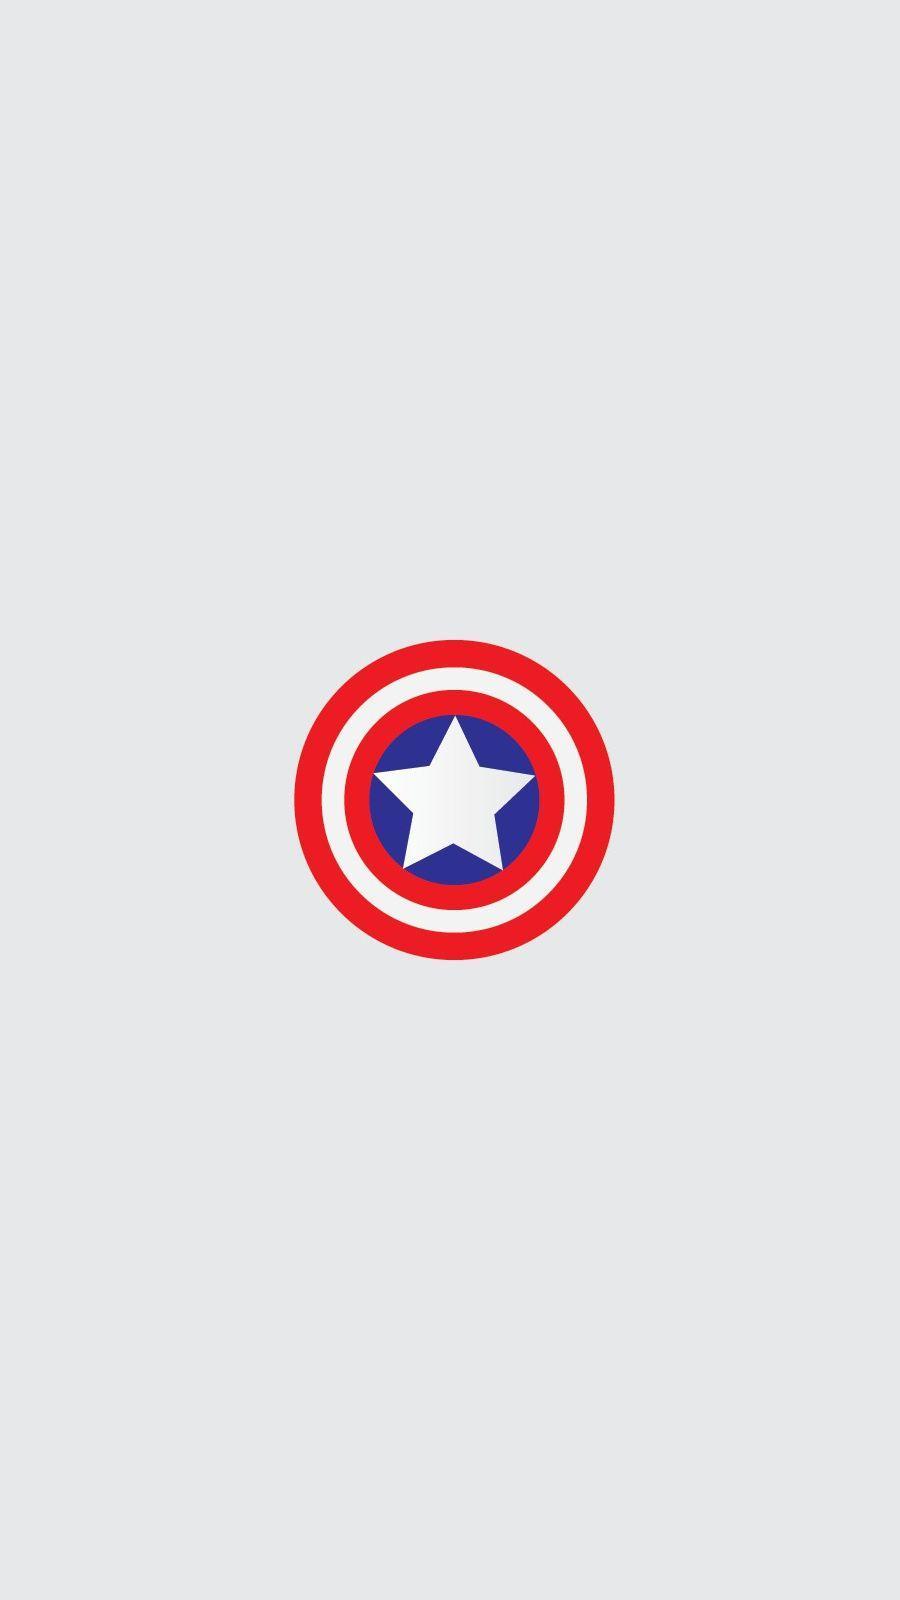 Captain America Logo Wallpapers - Top Free Captain America